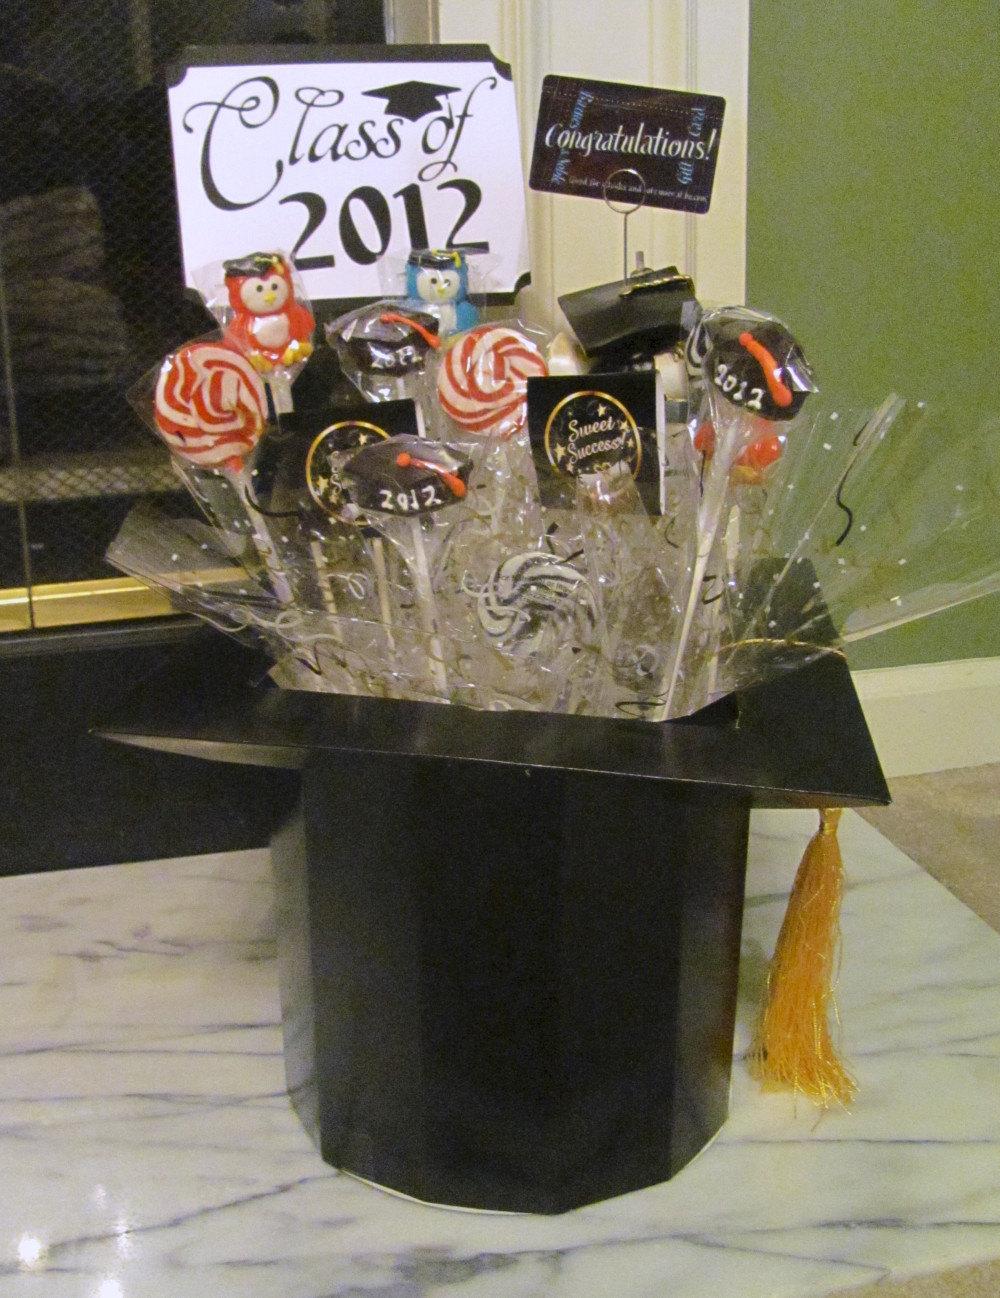 Graduation candy centerpiece featuring mortar board box on